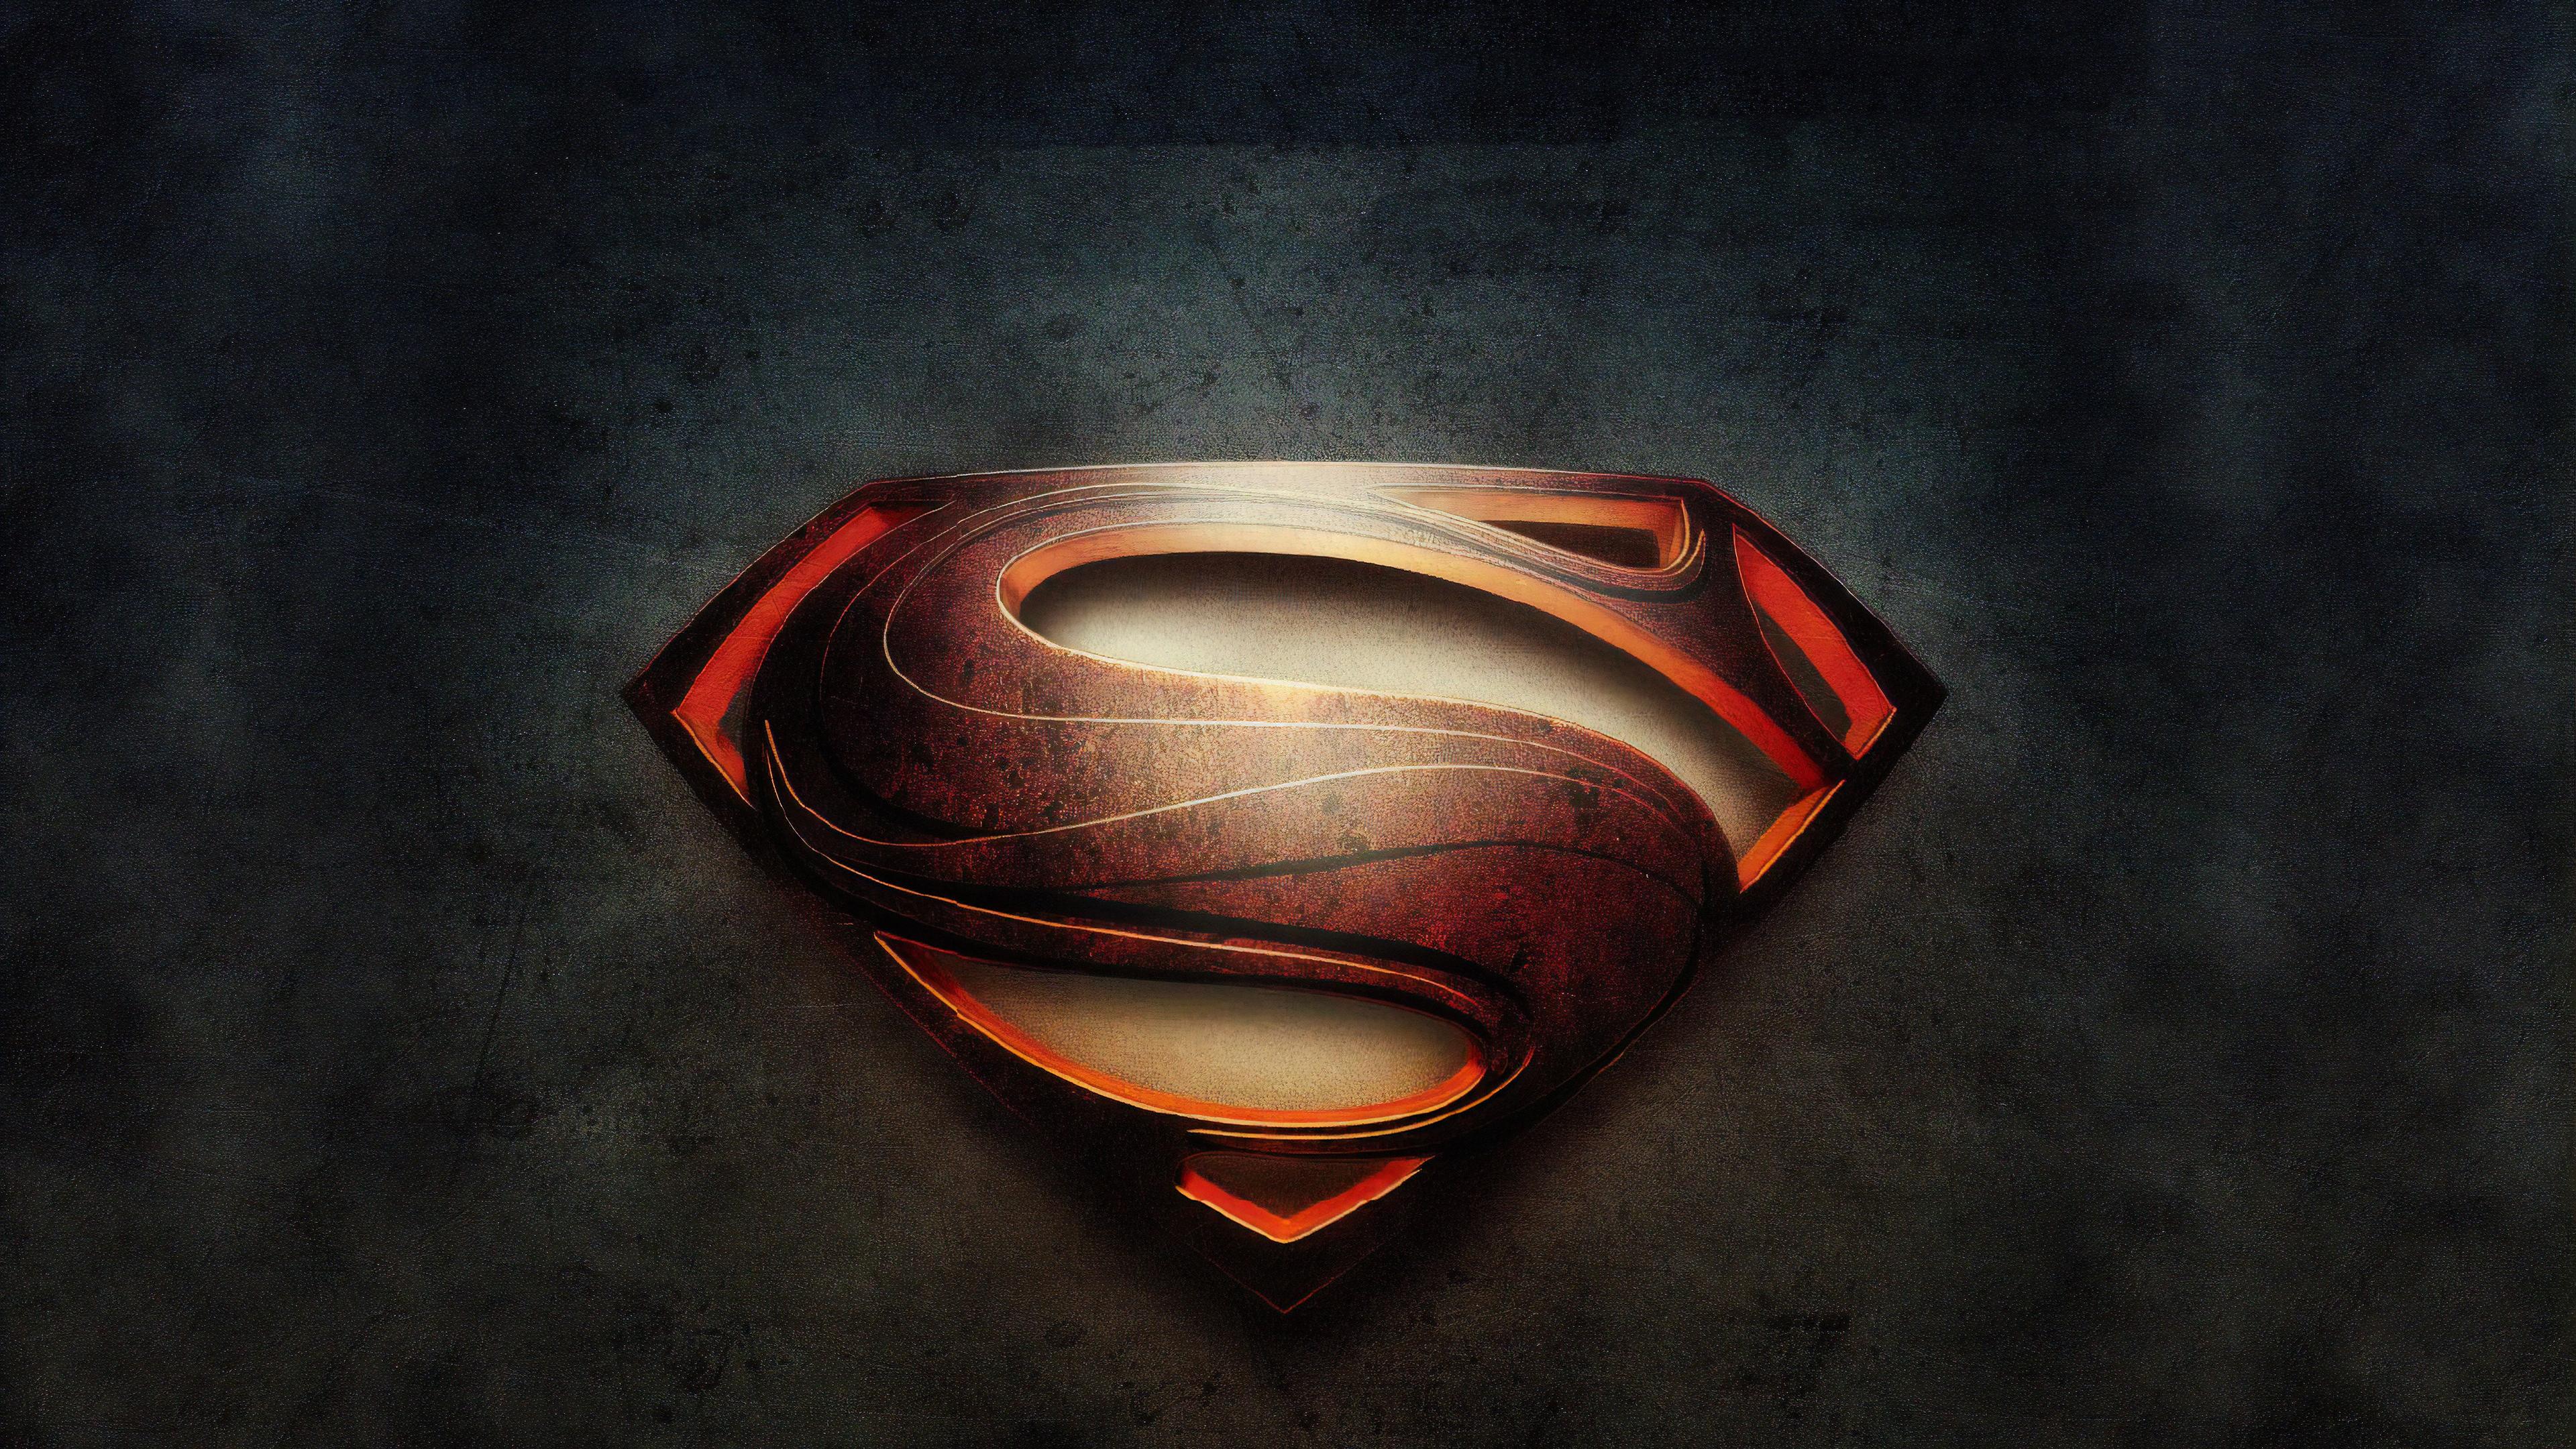 man of steel logo 1565053429 - Man Of Steel Logo - superman wallpapers, superheroes wallpapers, hd-wallpapers, digital art wallpapers, deviantart wallpapers, artwork wallpapers, 4k-wallpapers